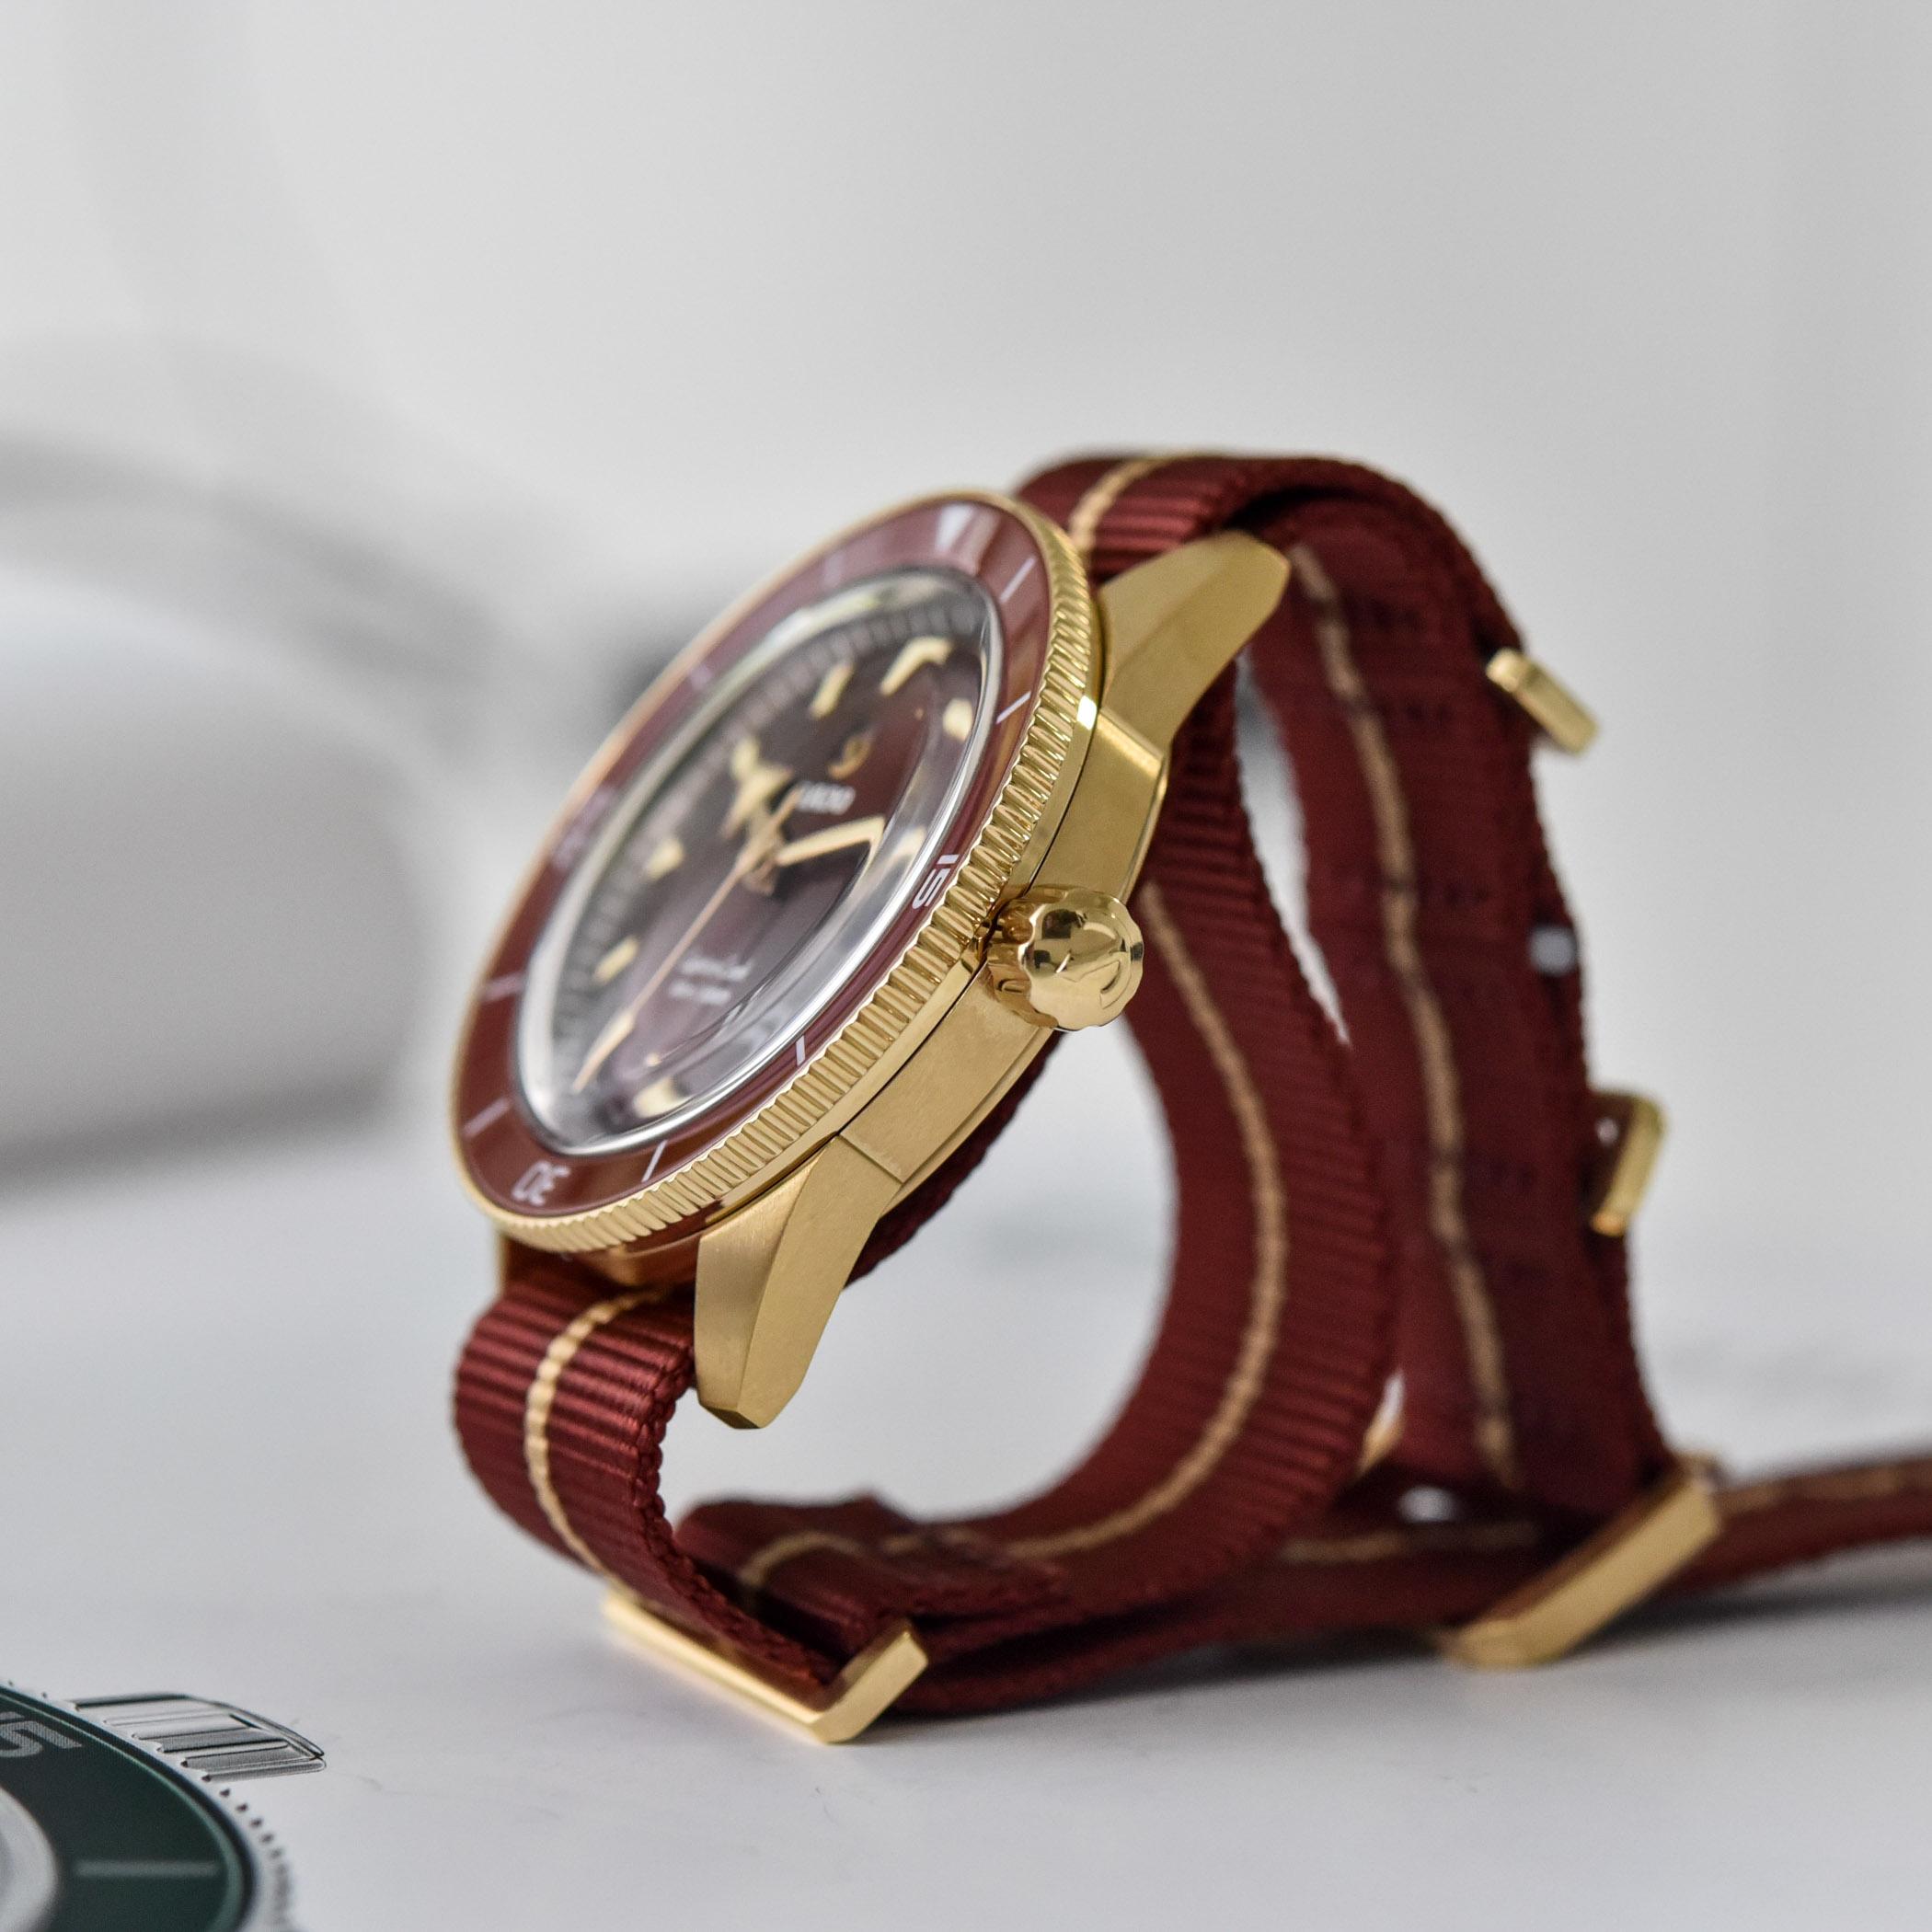 Rado Captain Cook Bronze Burgundy Automatic